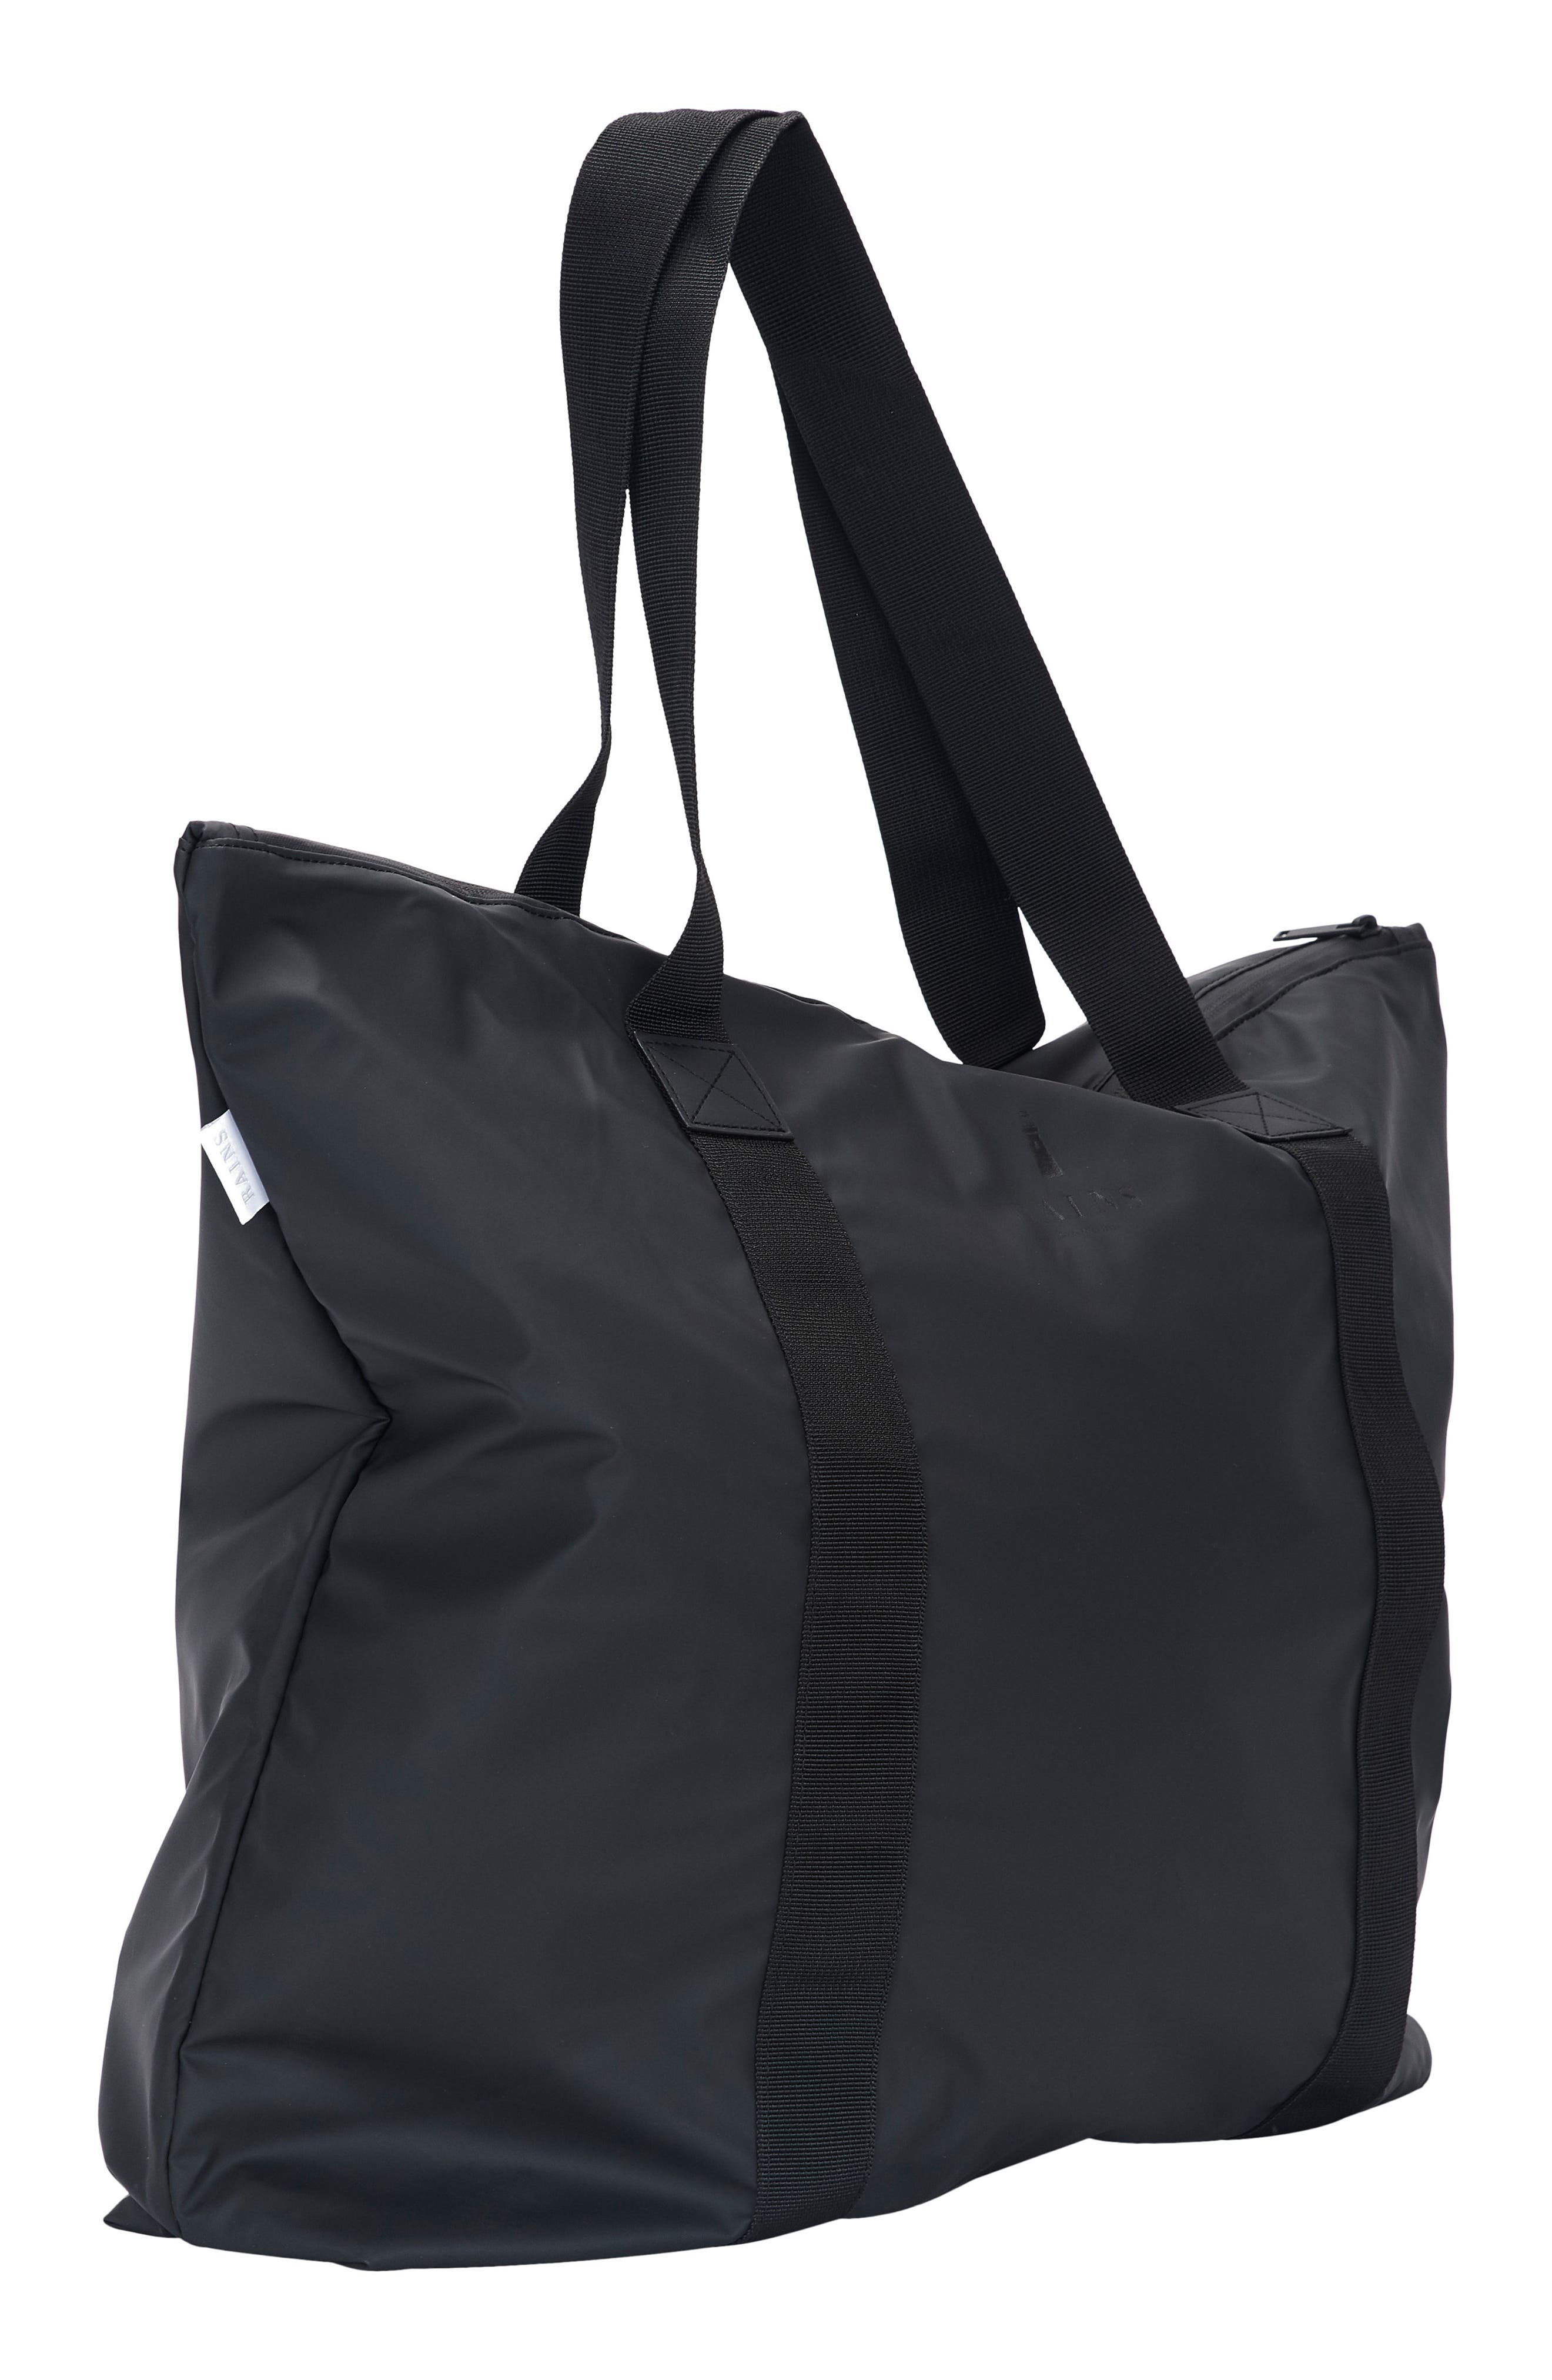 Waterproof Tote Bag,                             Alternate thumbnail 3, color,                             BLACK